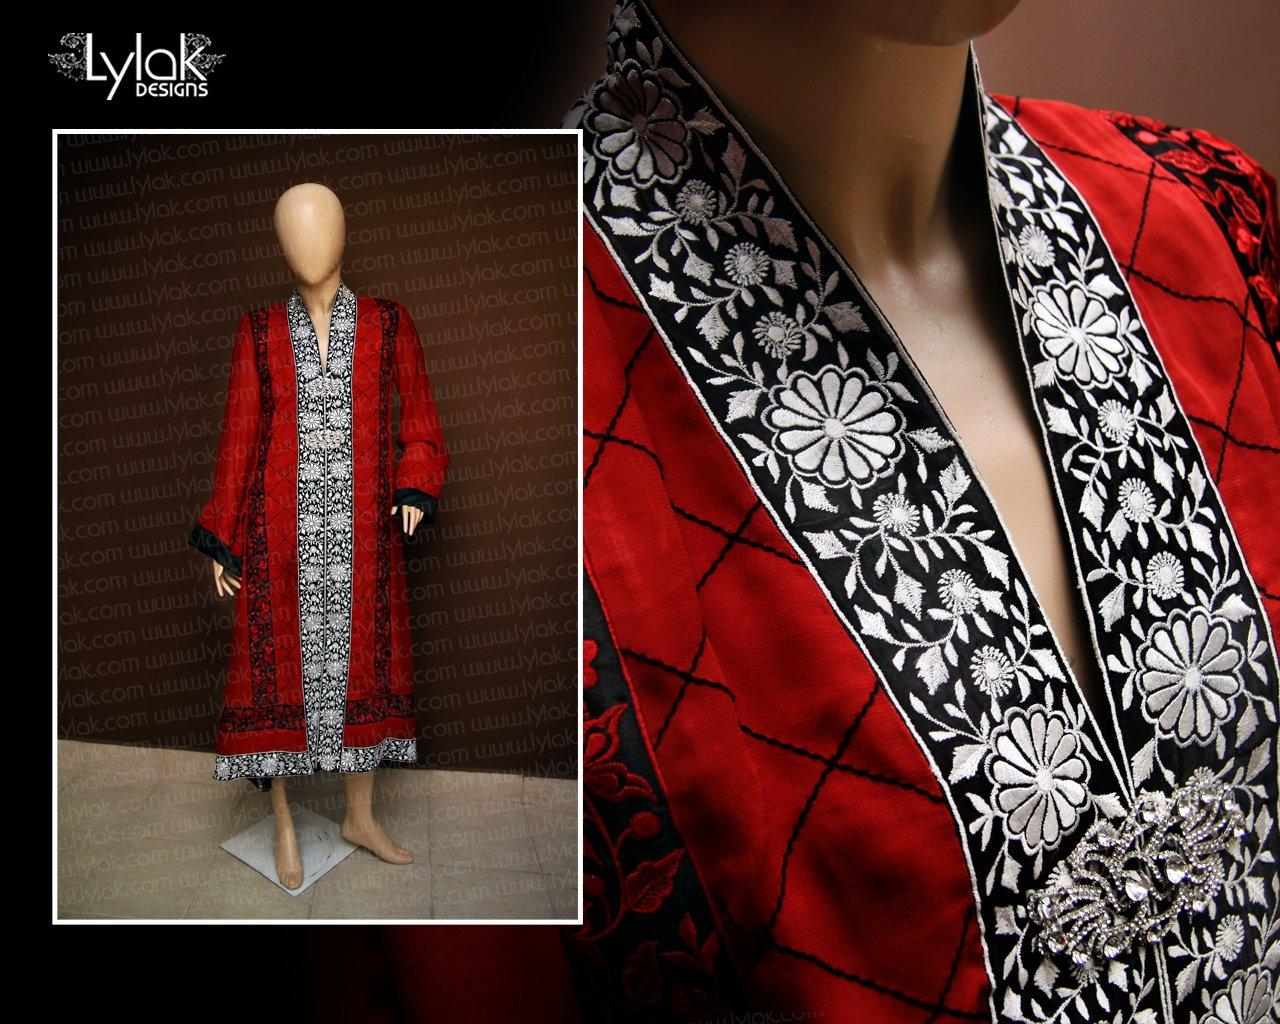 Red Formal Dress by Lylak Designs 004